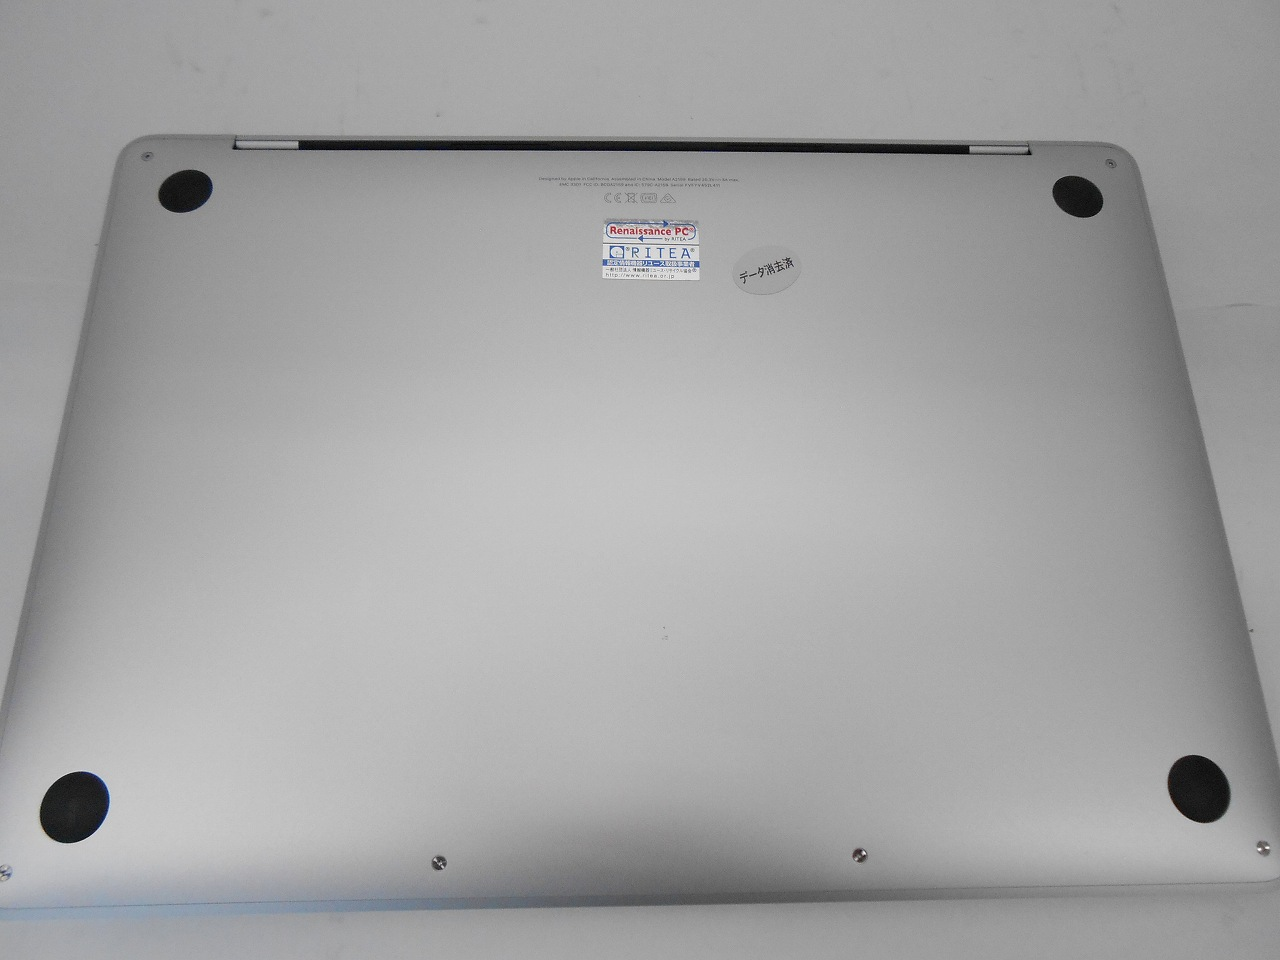 Aランク【中古】 Apple MacBookPro MUHQ2J/A/Mid2019/Corei5 1.4GHz/メモリ8GB/SSD128GB/13インチ/Mac OS Mojave【3ヶ月保証】【足立店発送】